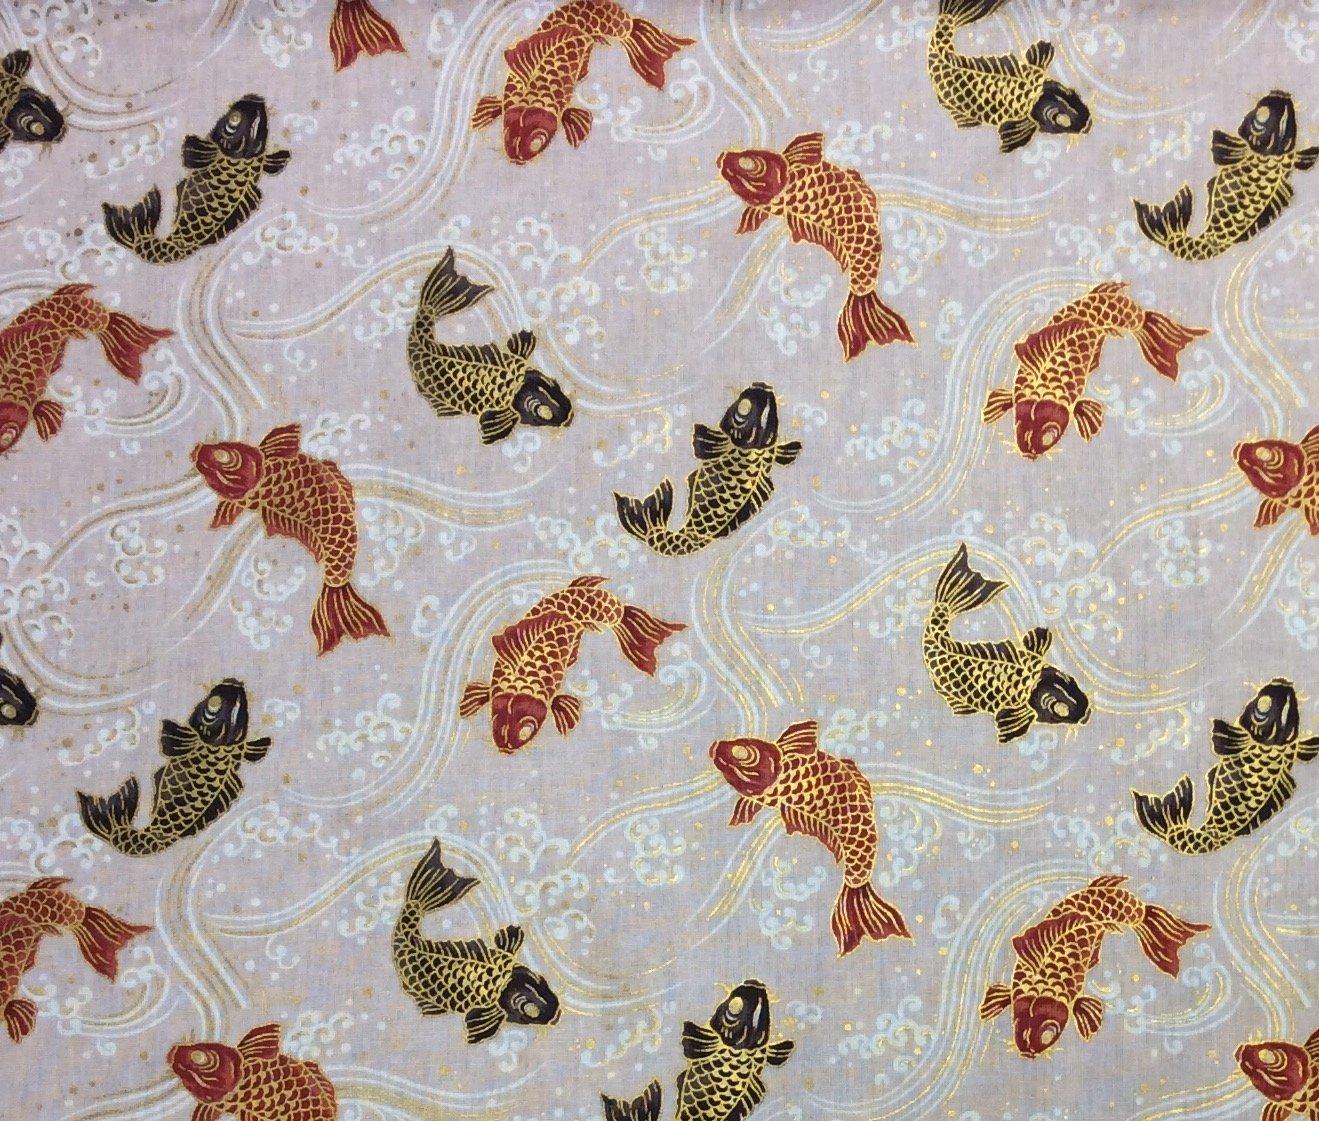 Koi Fish Japanese Asian Kimono Print Cotton Quilt Fabric NT59